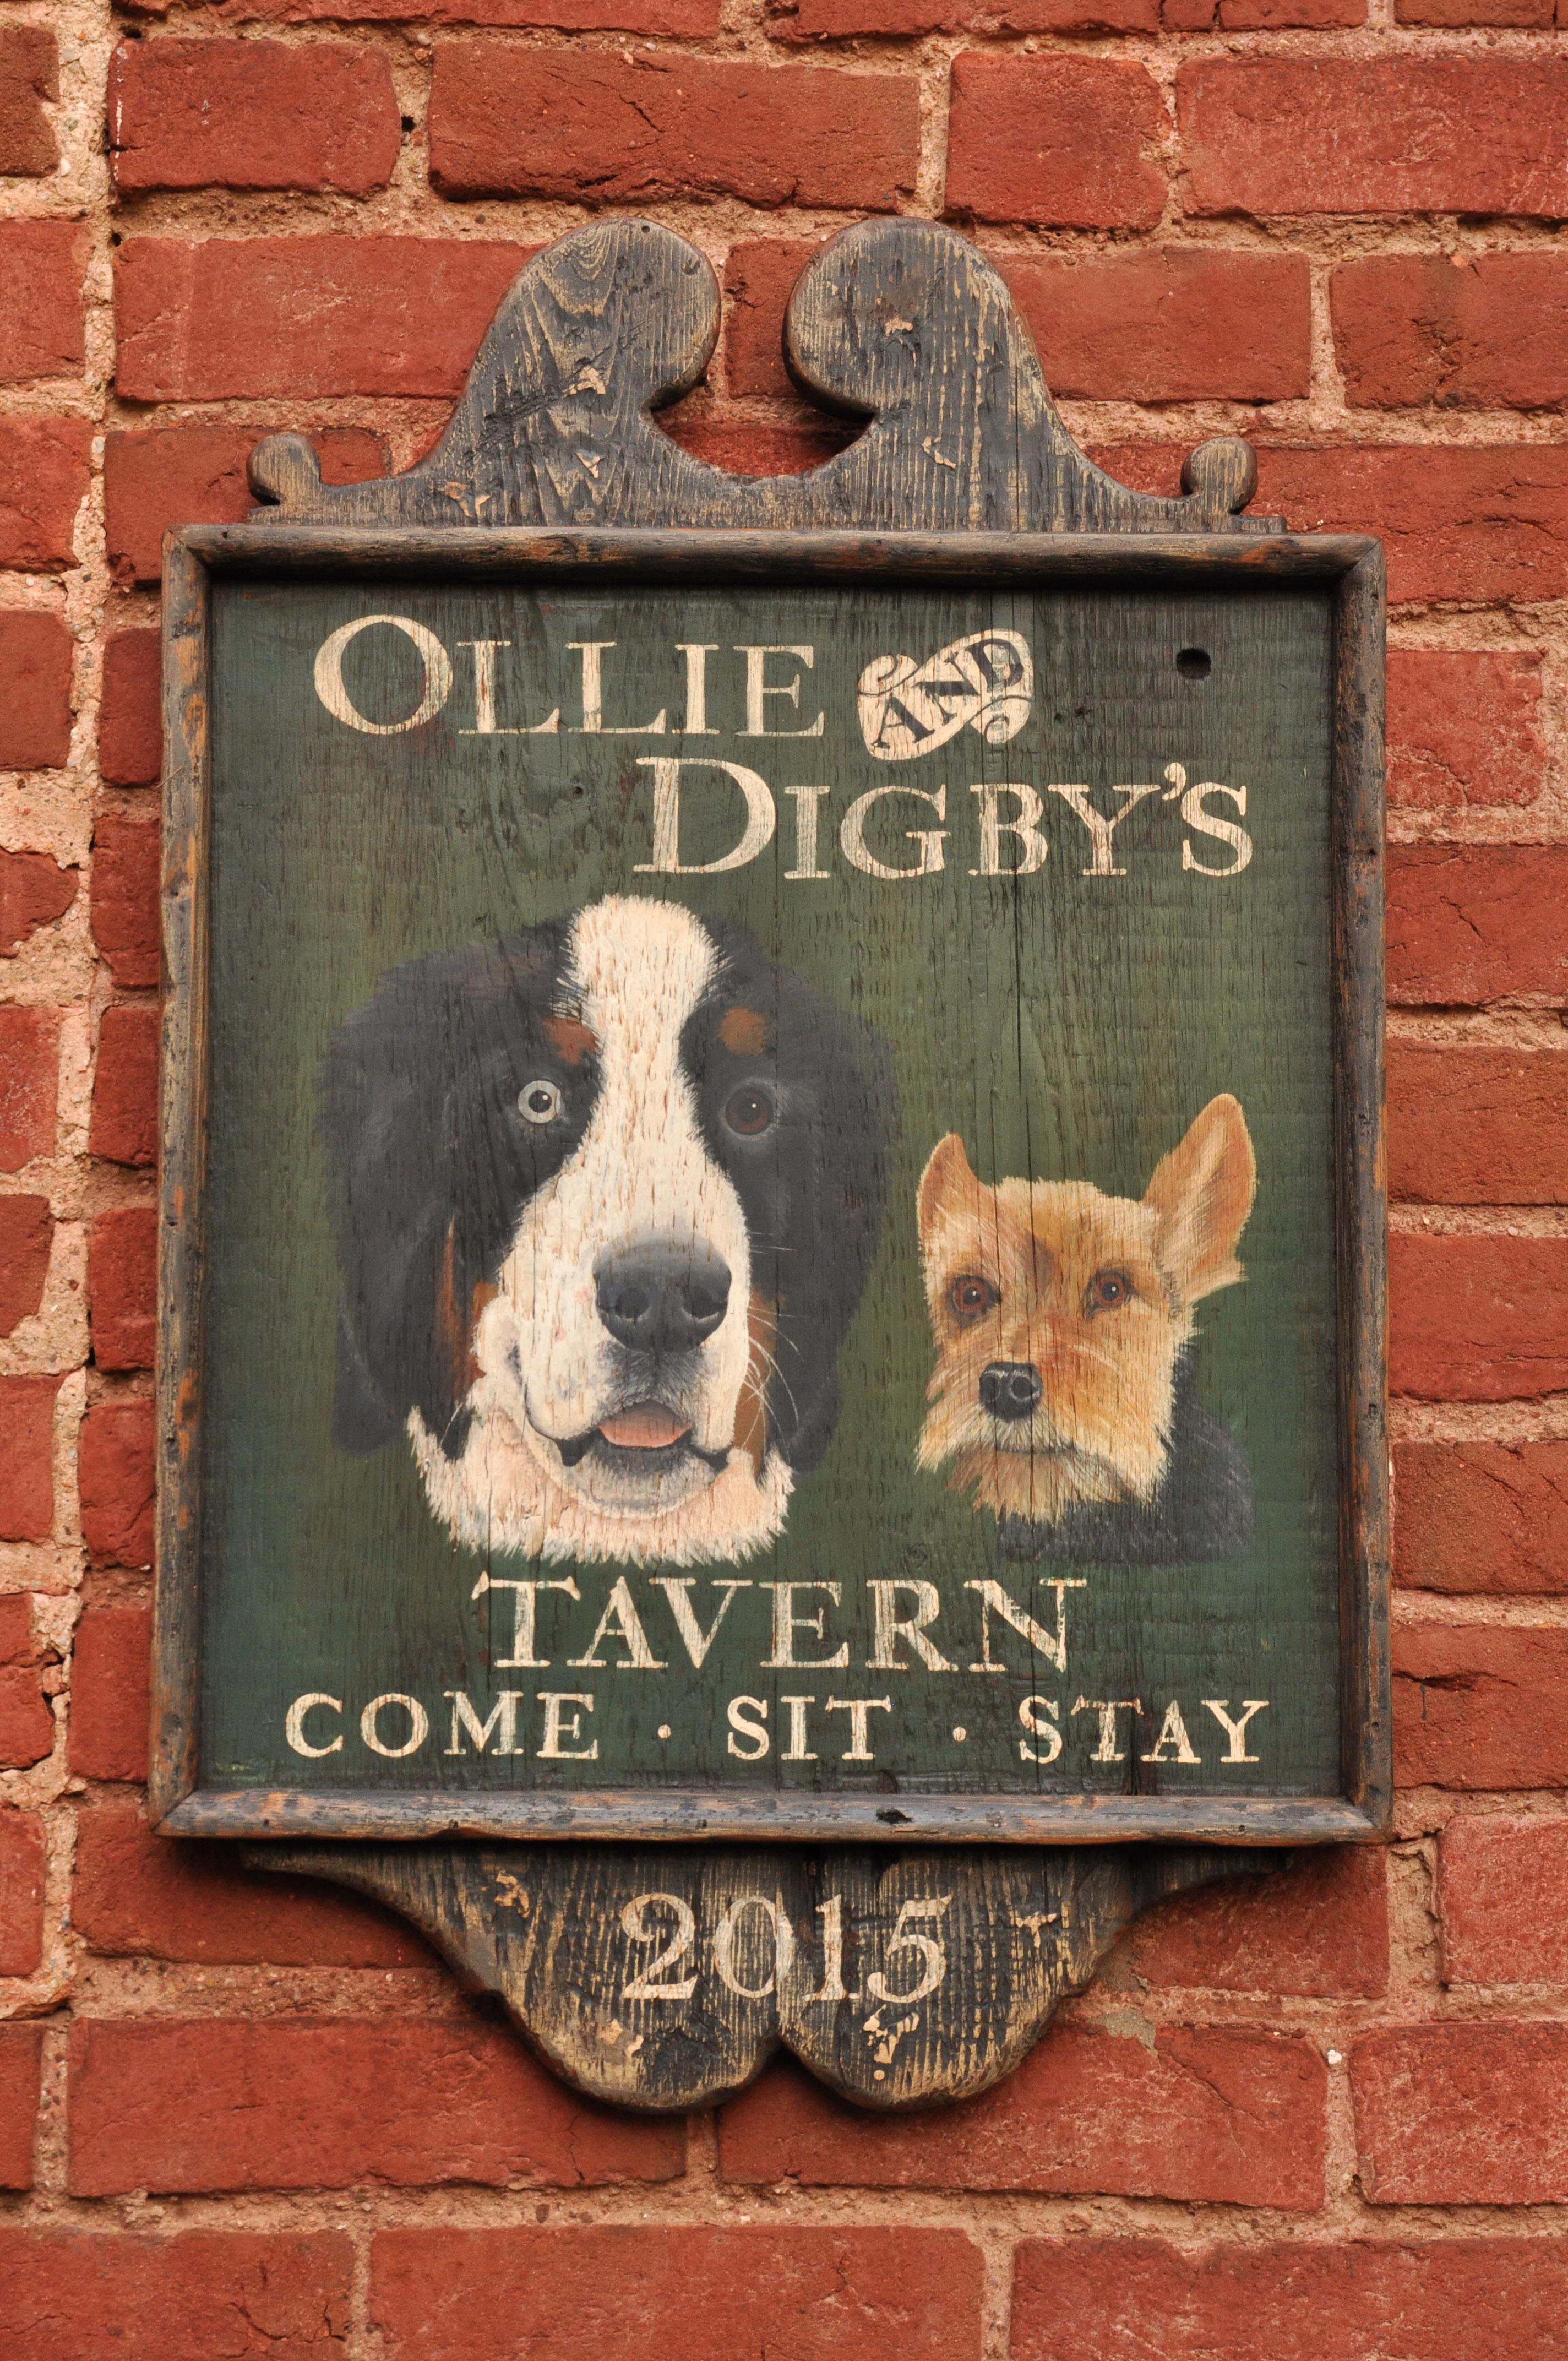 Olllie & Digby's Tavern